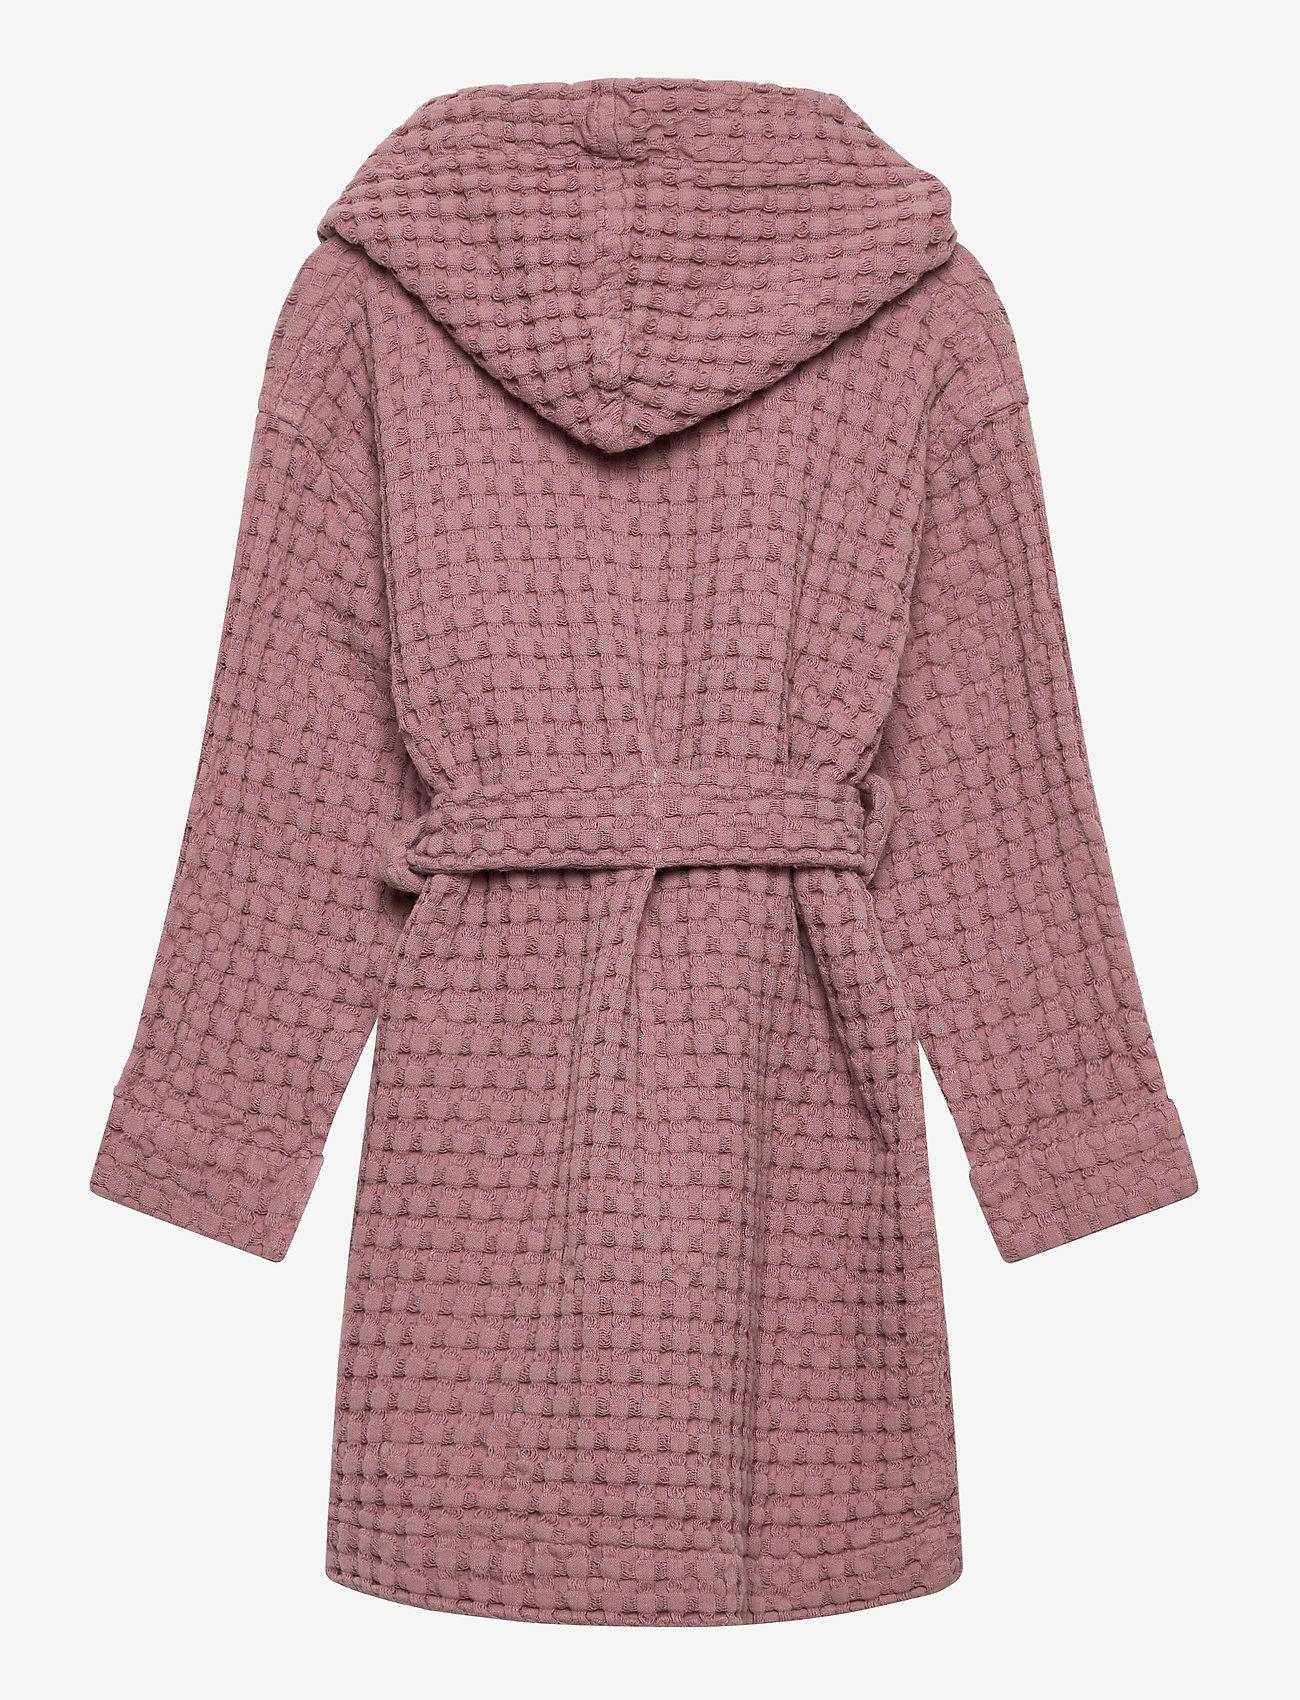 Cozy by Dozy - Cozy by Dozy Bath Robe - bathrobes - pink - 1